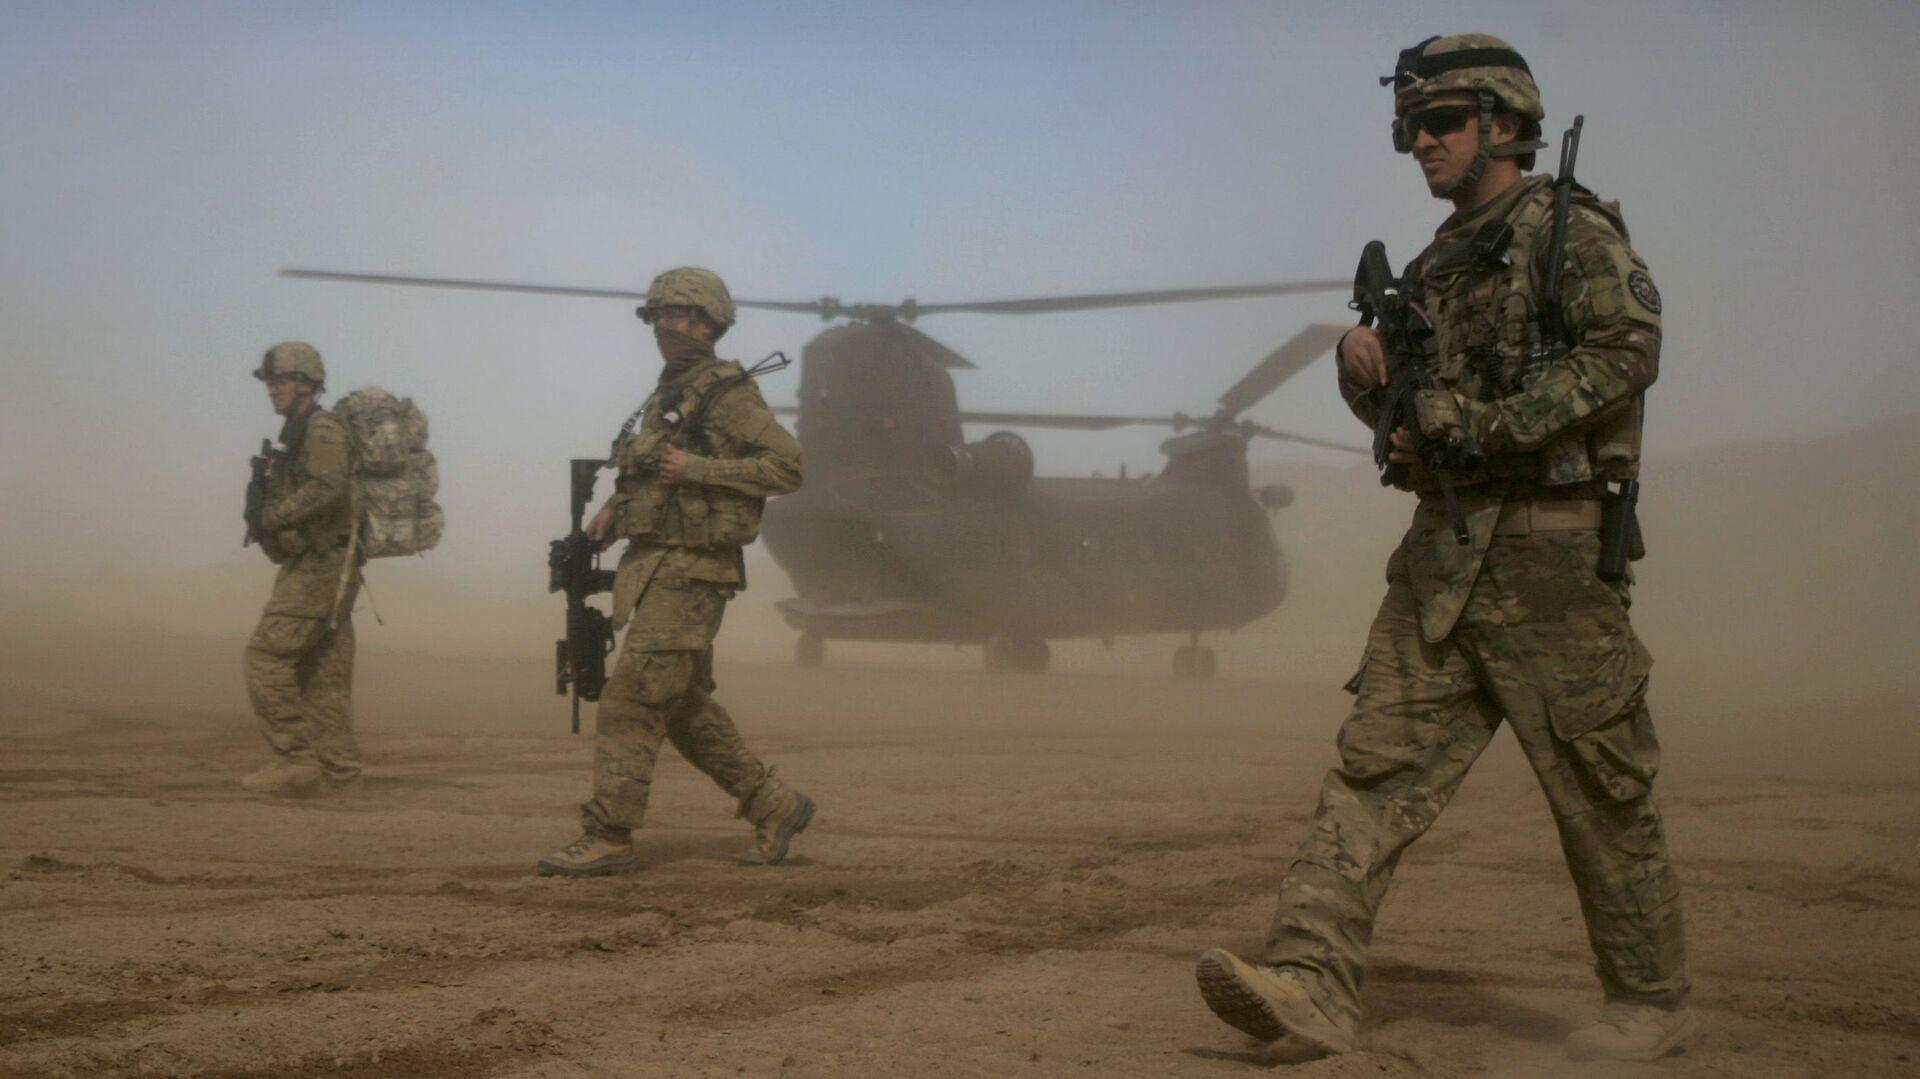 Военнослужащие США в Шинданде, Афганистан - Sputnik Таджикистан, 1920, 02.07.2021